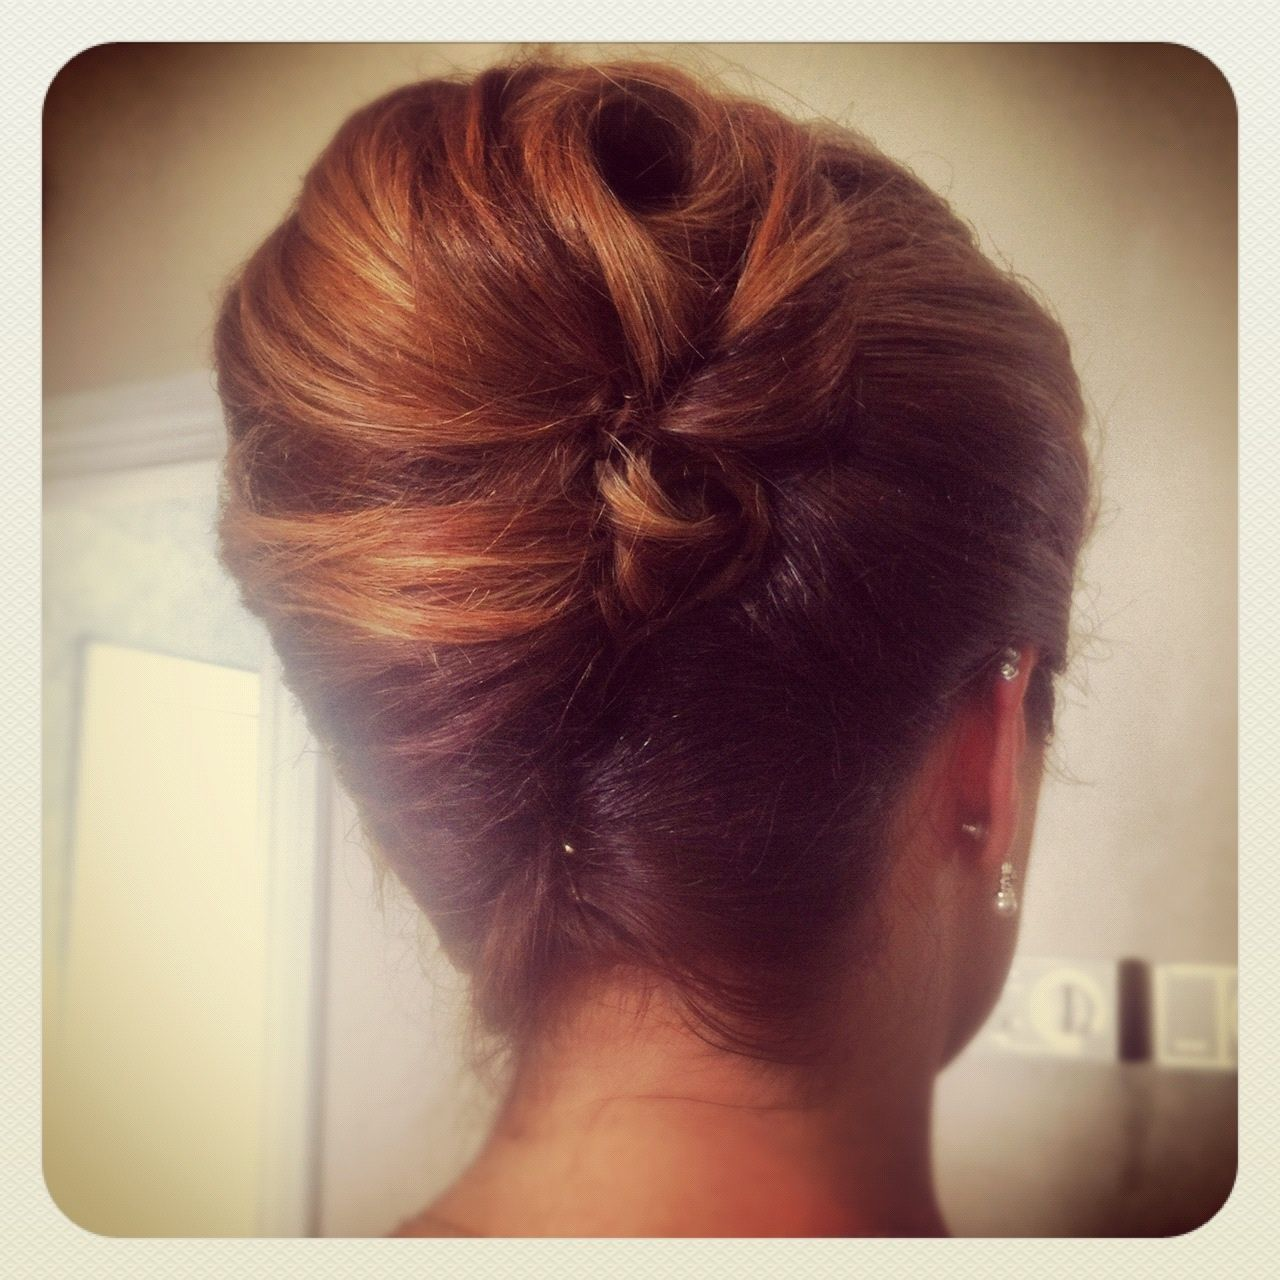 Classic French twist, wedding hairstyles , elegant hairstyles, bridesmaids hair, hairstyles for weddings, updos #hairbyalyse #alysecamara